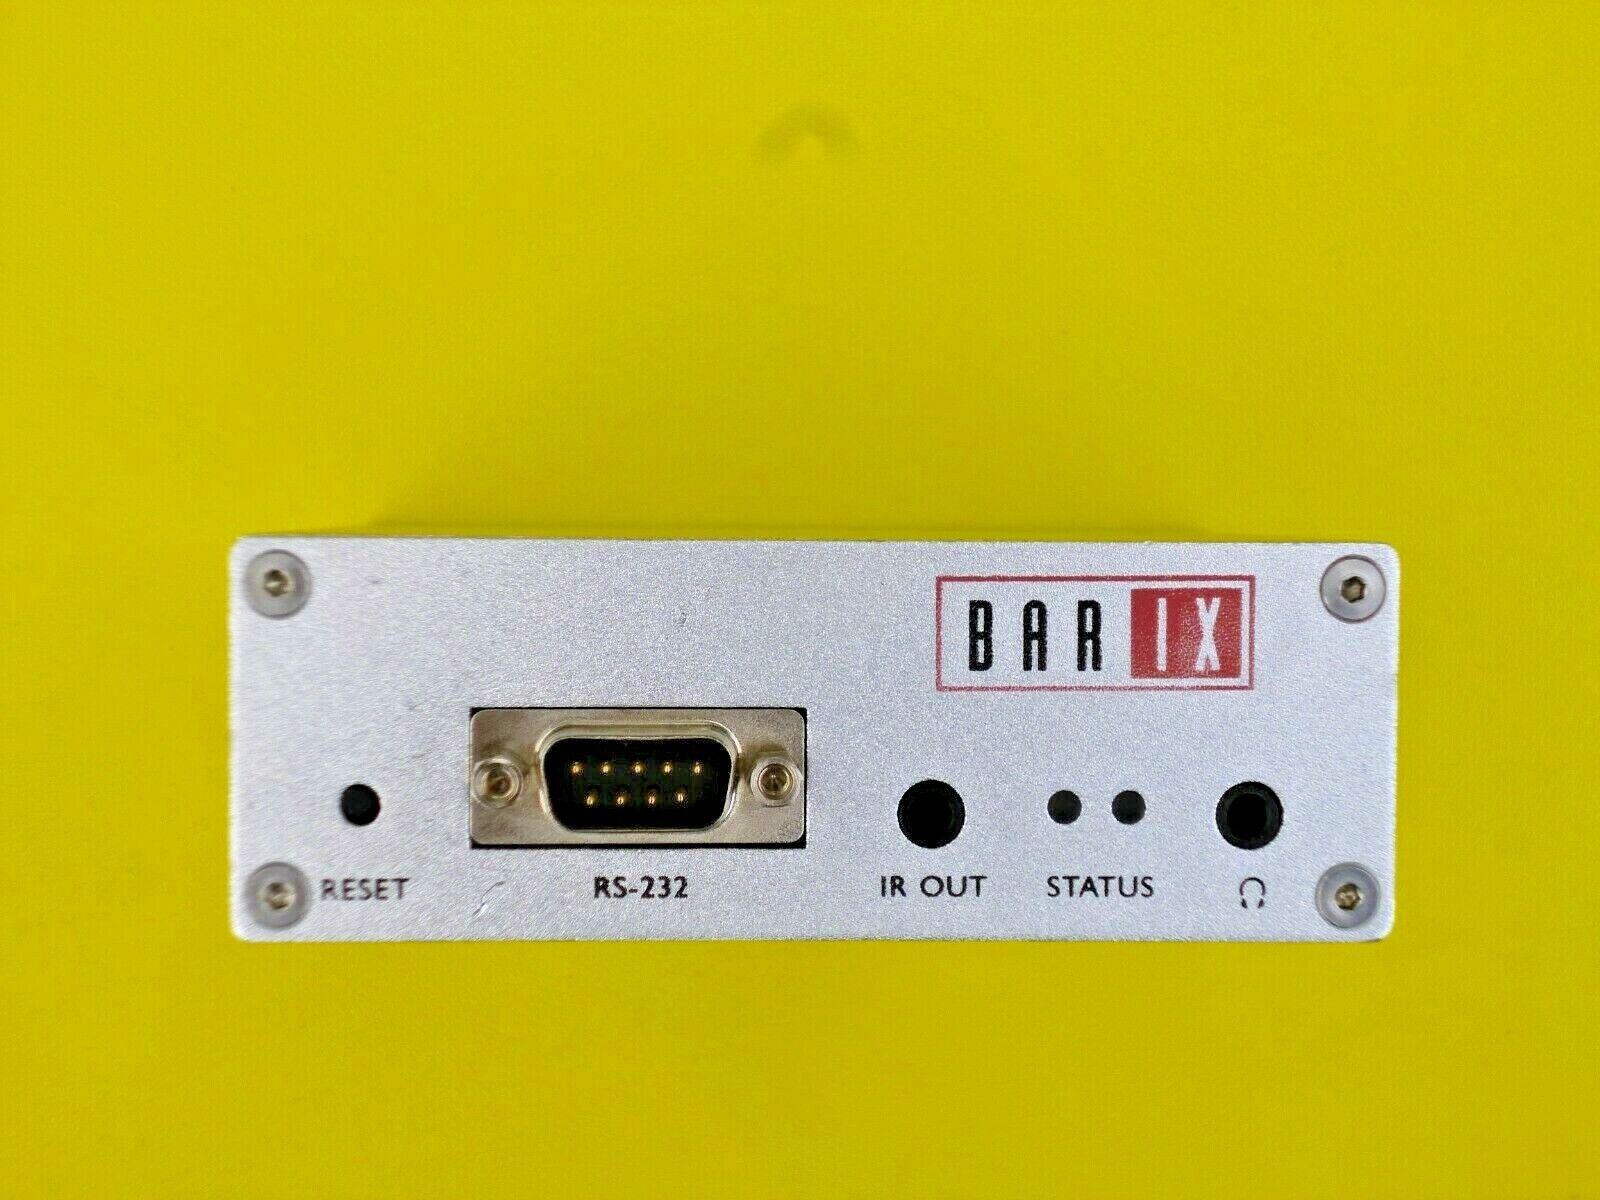 Barix Instreamer 100 - Network Audio Encoder - Refurbished Latest Firmware